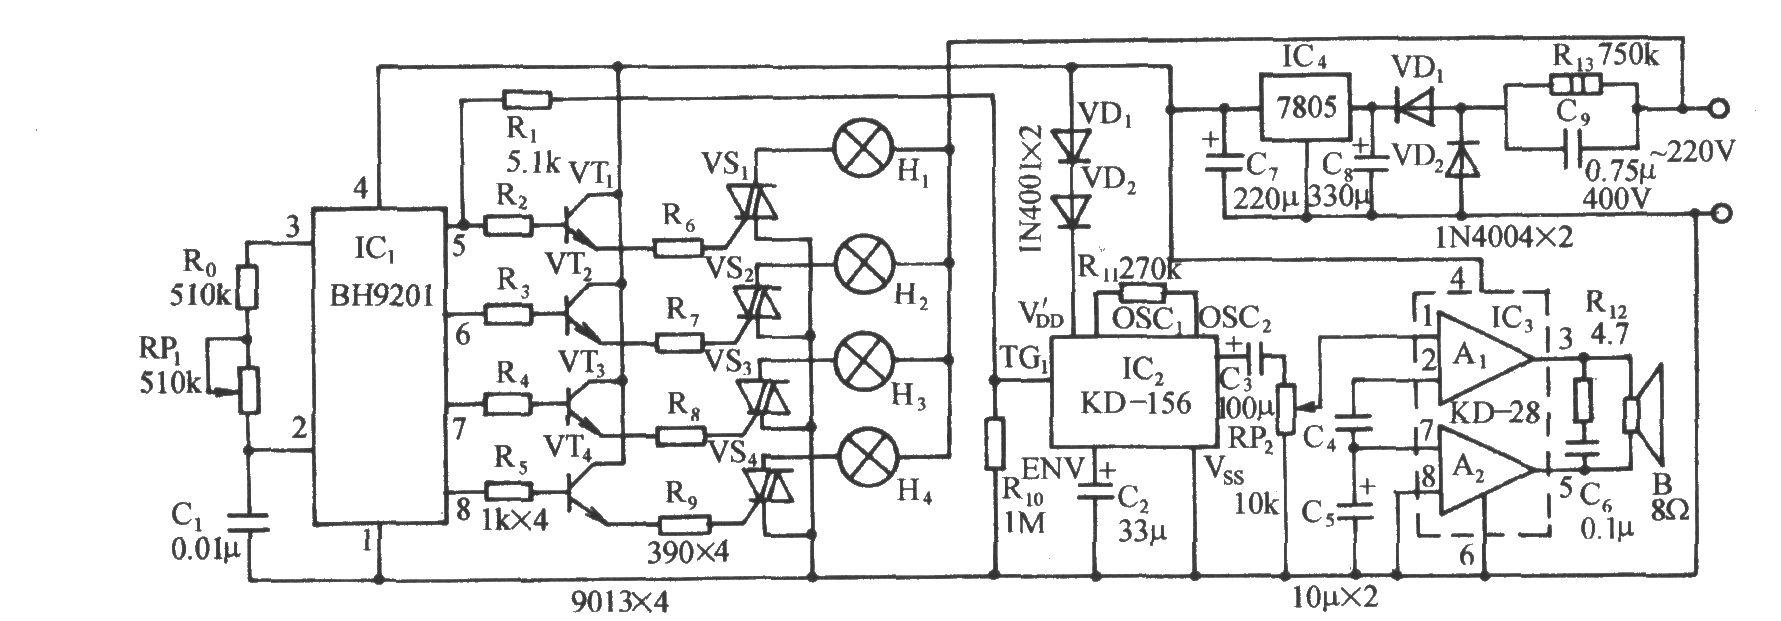 bh9201是一种专用彩灯控制集成电路,它有四路控制信号输出,调节接在